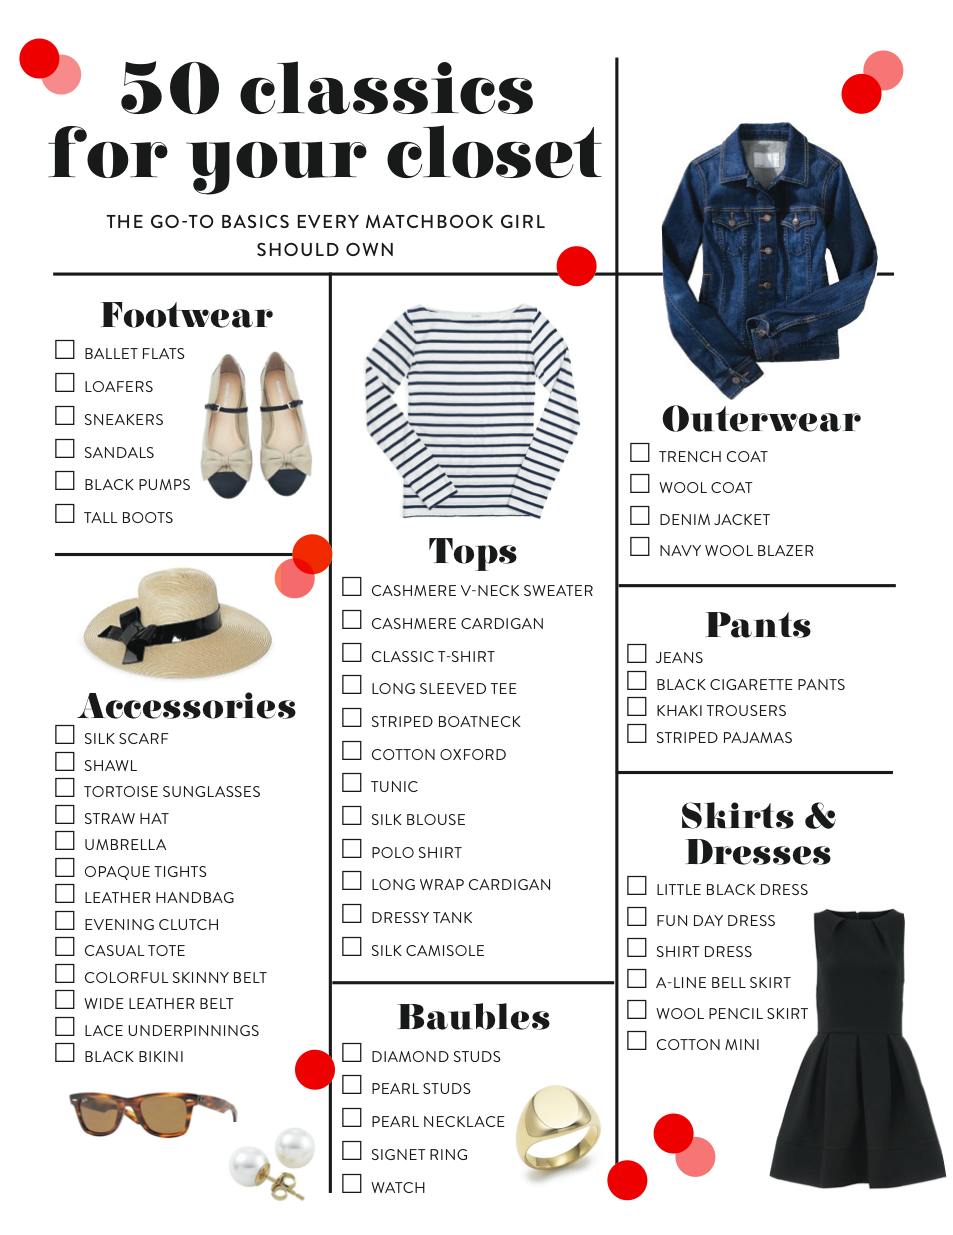 Lovely U002750 Classics For Your Closetu0027 Checklist #FashionTips (Favorite List Tips)